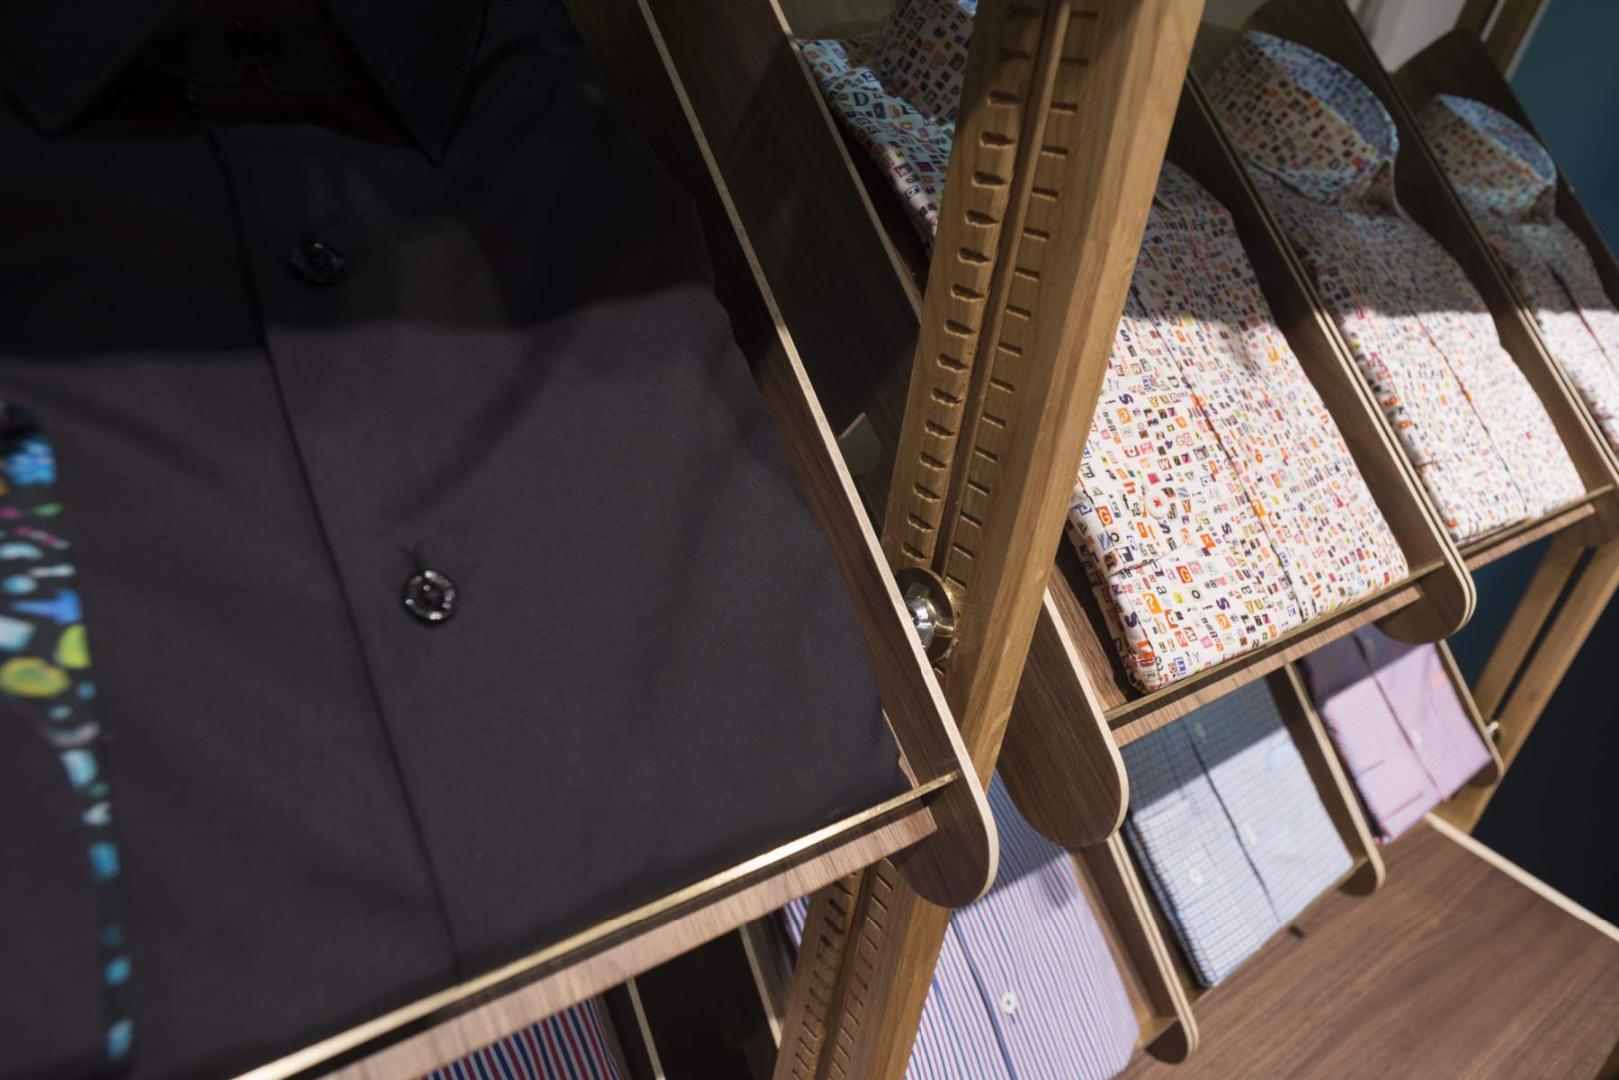 Braiconf magazin shop marriott mobilier lemn masiv furnir design dinamic017